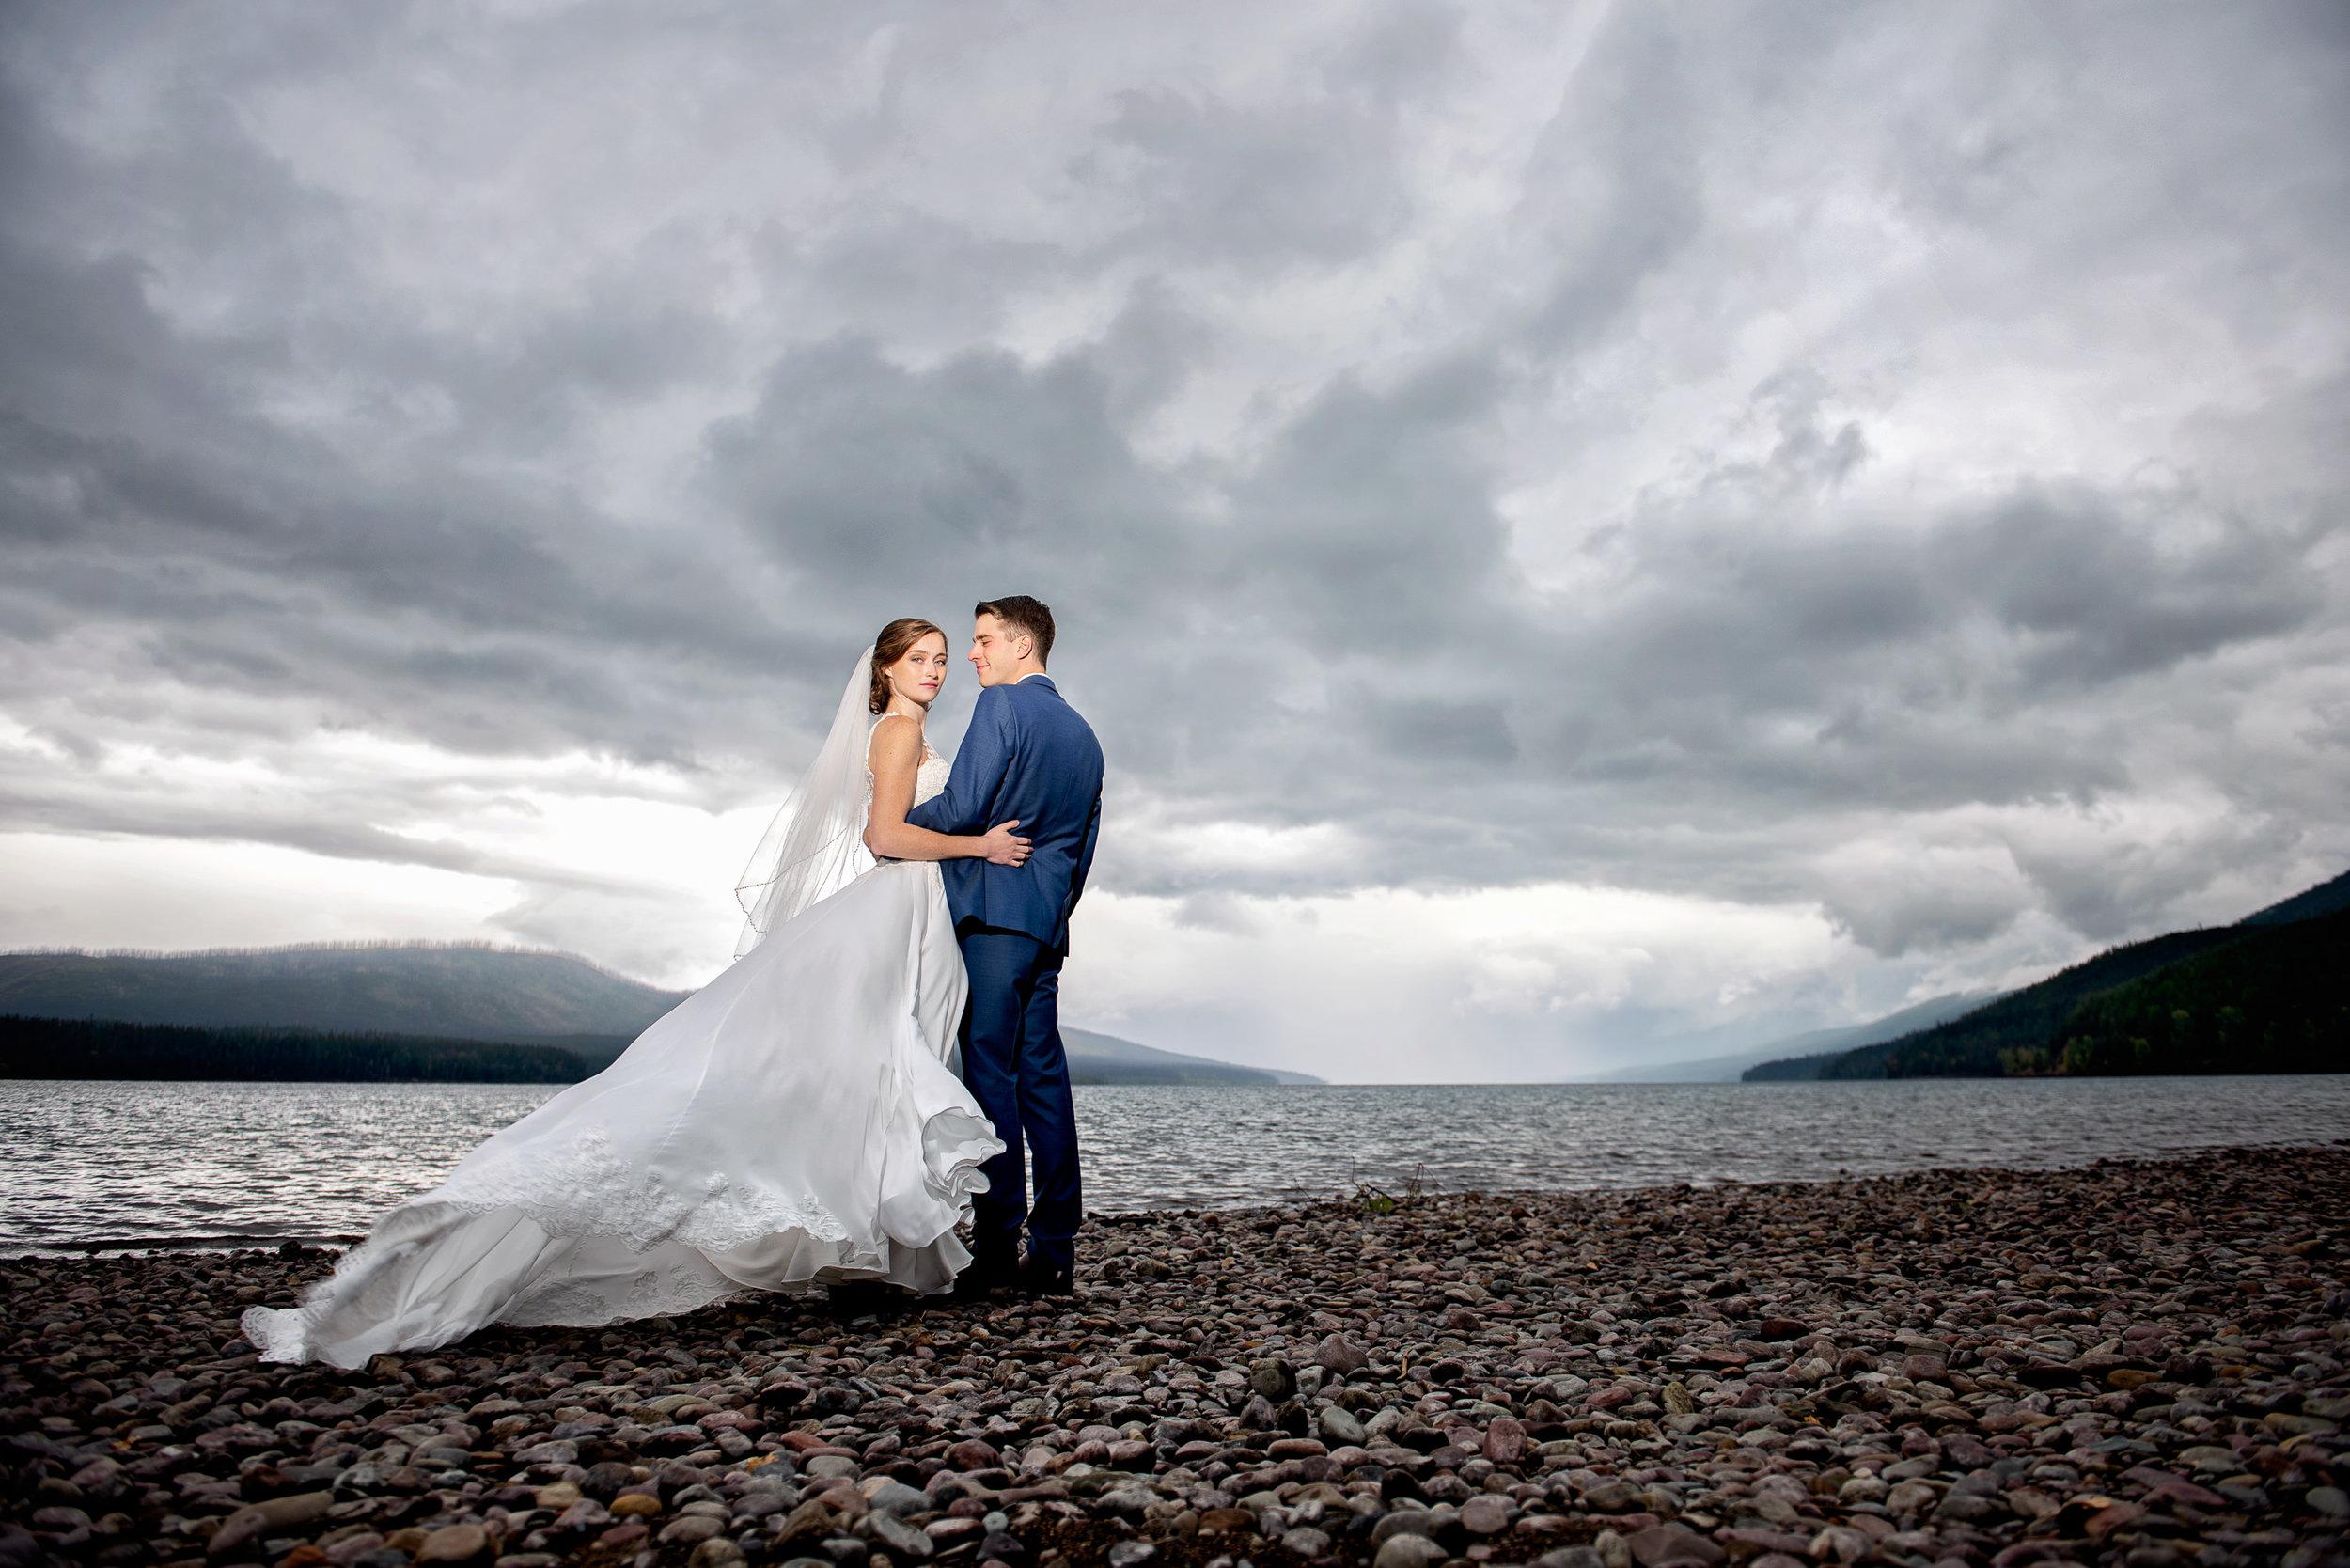 Glacier-National-Park-Wedding-Photographer-442.jpg